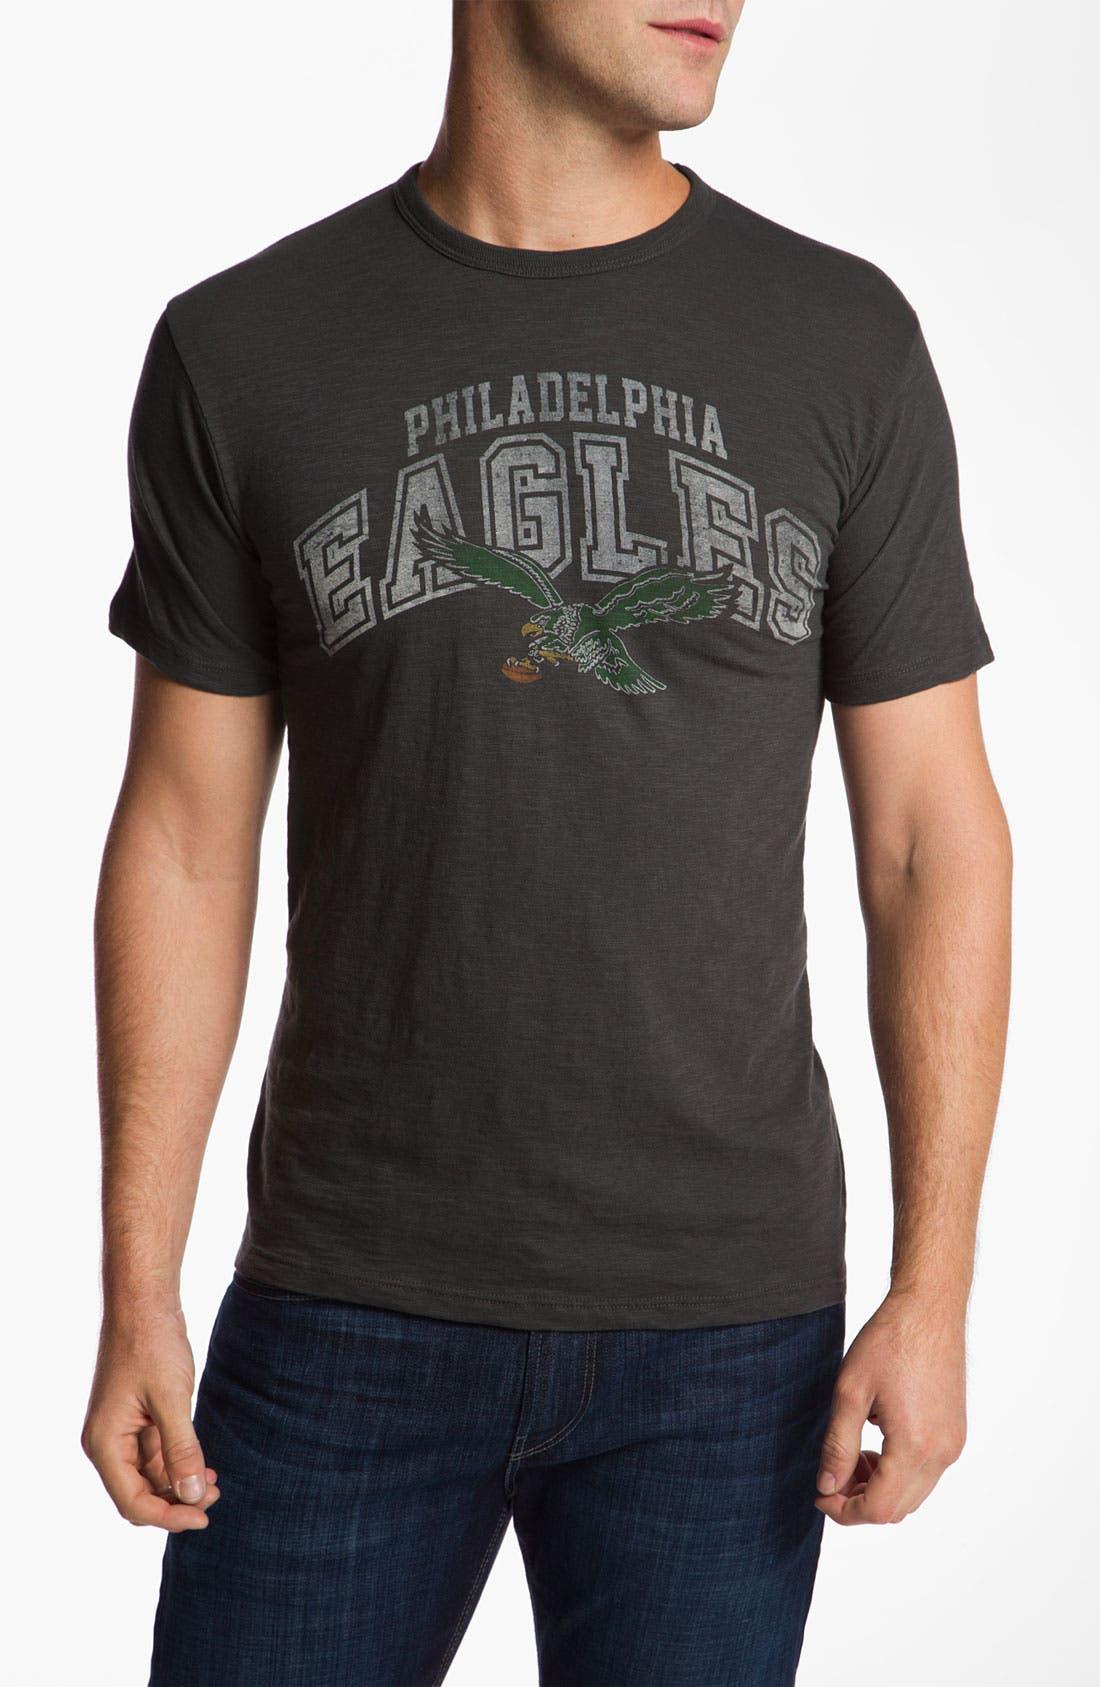 Main Image - '47 'Philadelphia Eagles' T-Shirt